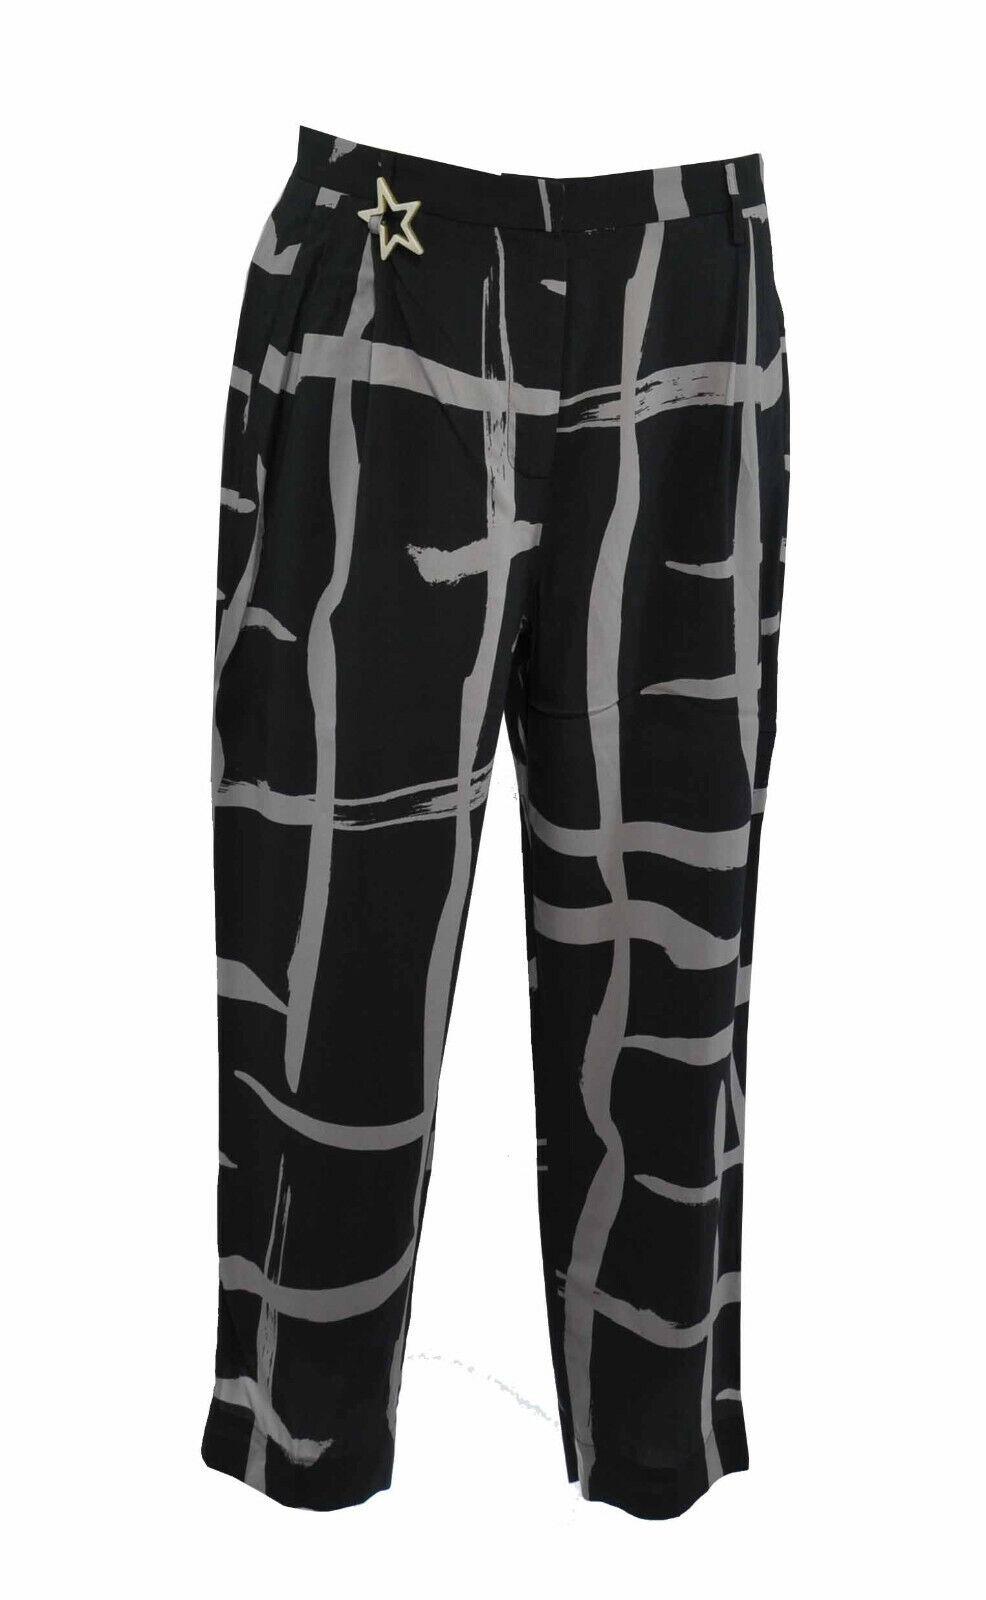 Lorena Antoniazzi  Graphite   Stone Patterned Trousers  44  Designer